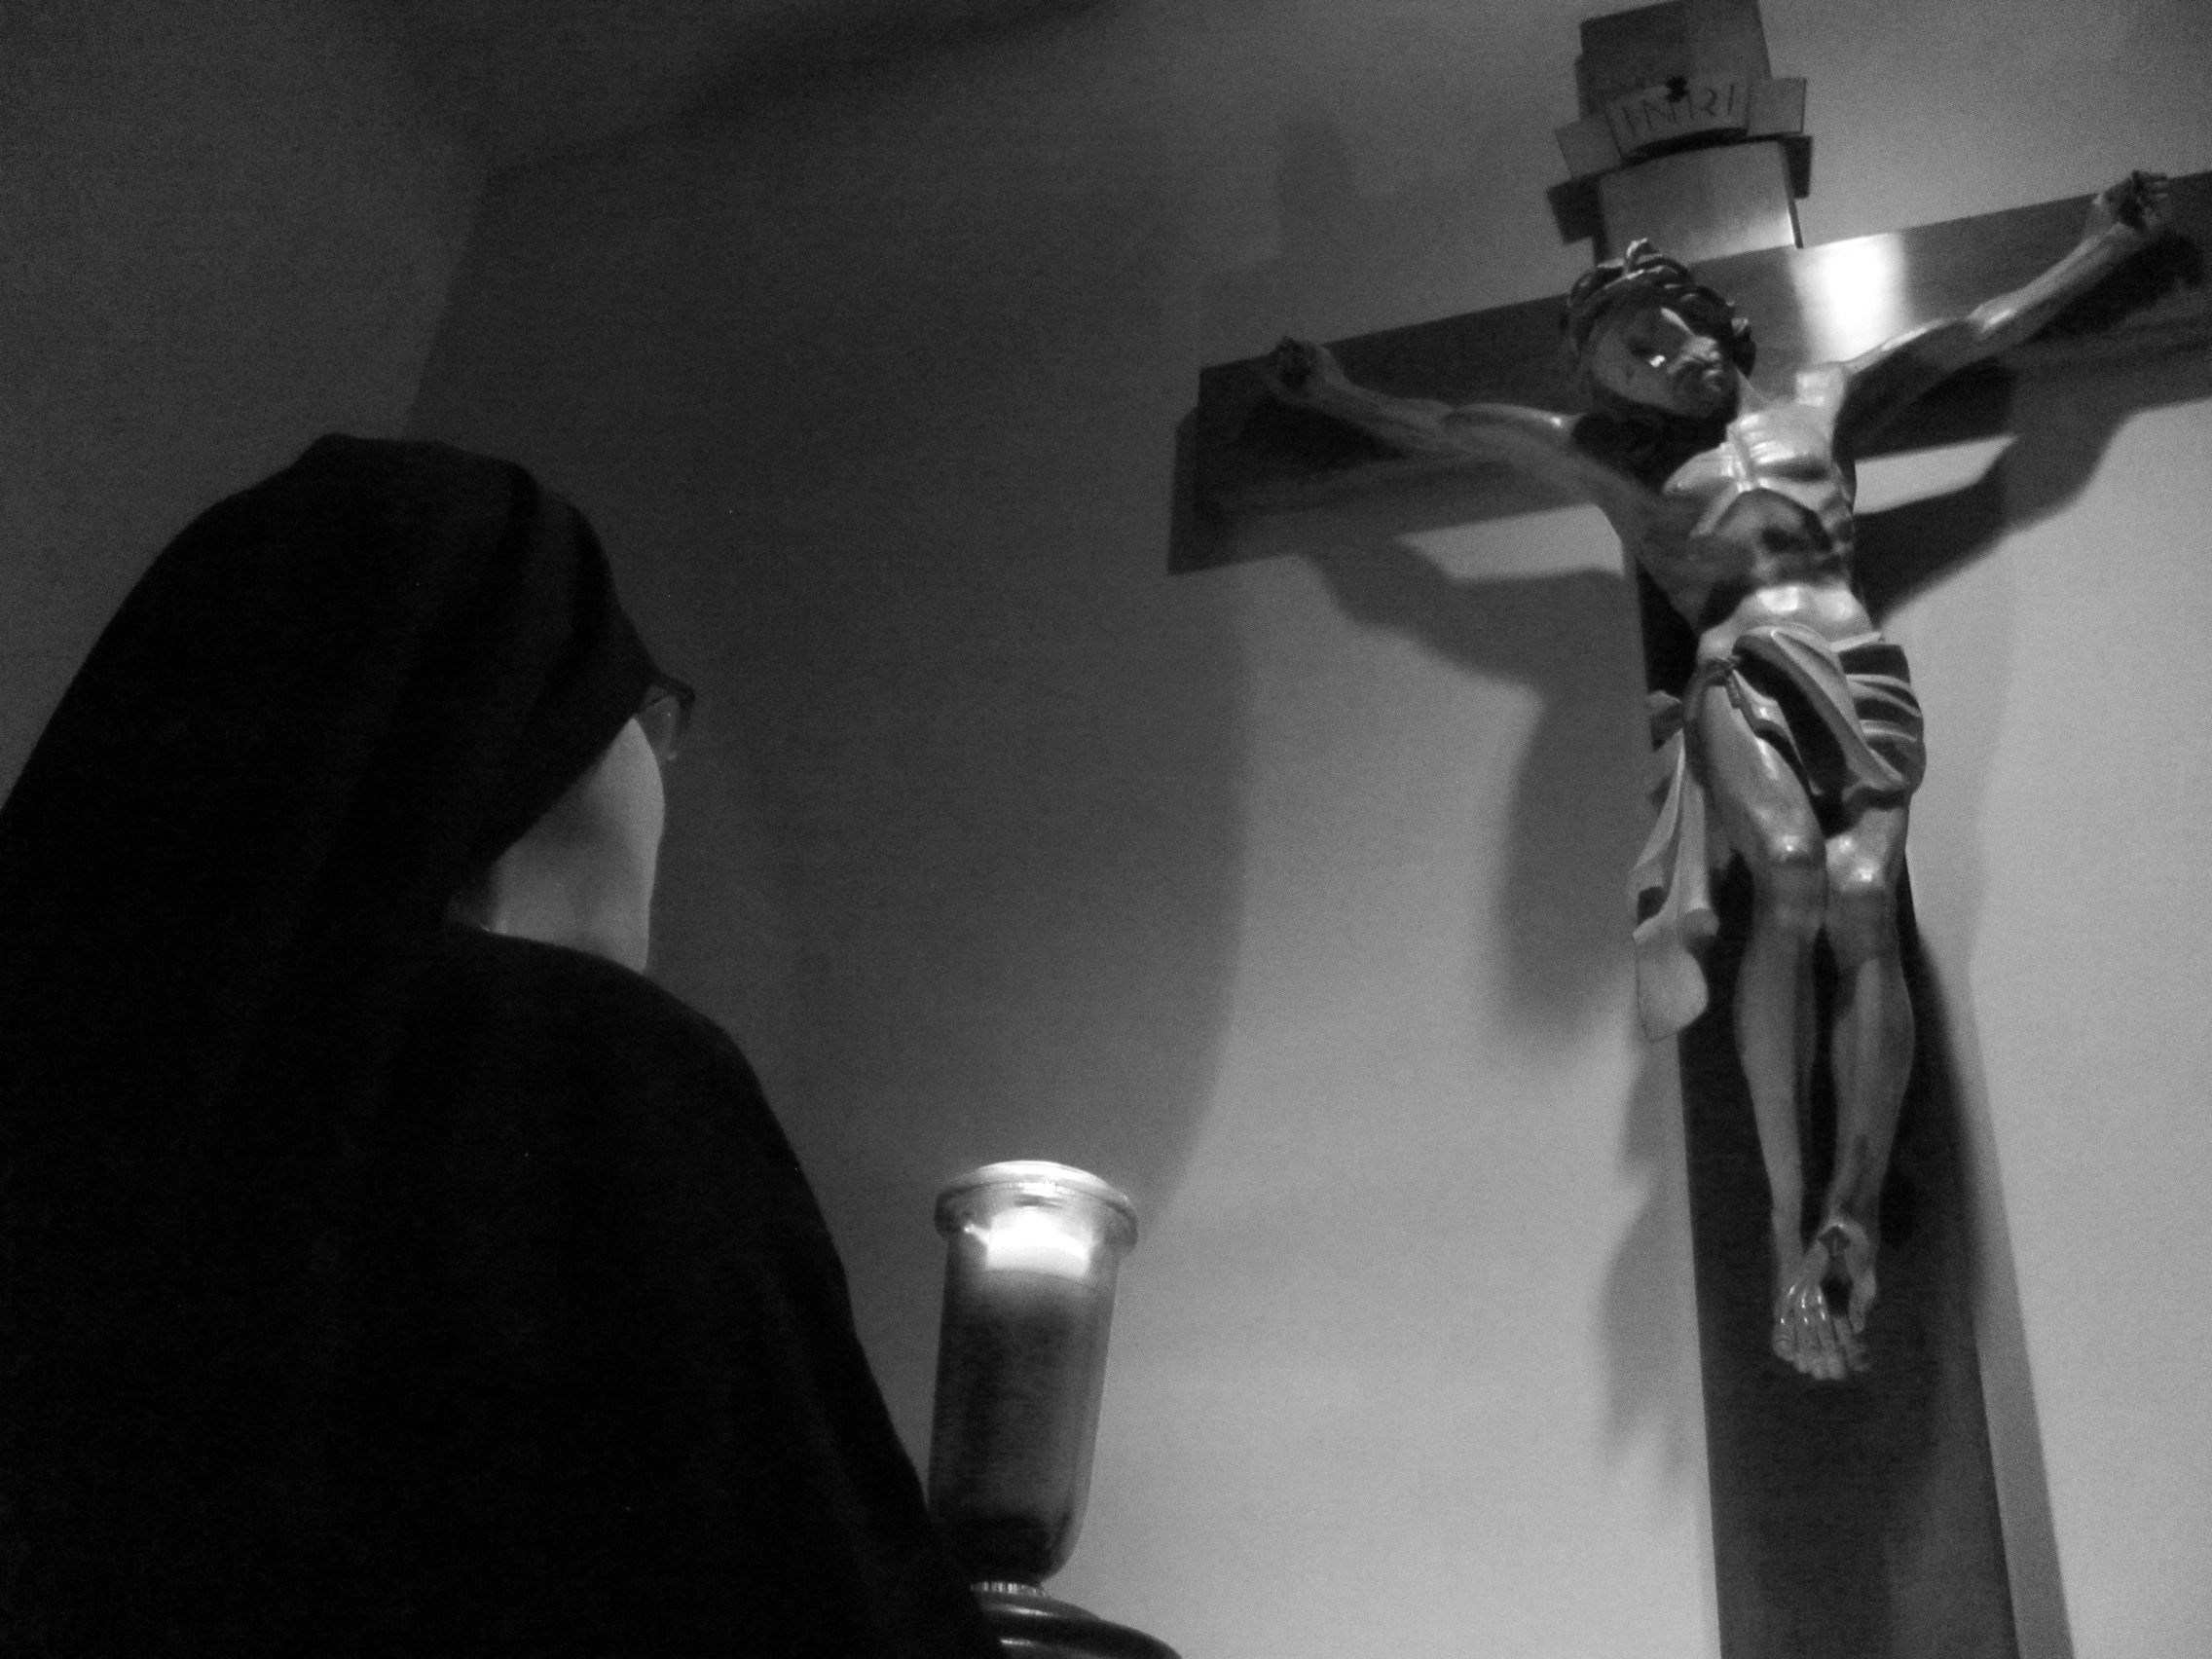 Holy Week Liturgies - Palm Sunday Mass - April 14 - 8:00amHoly Thursday Mass - April 18 - 7:00pmGood Friday Liturgy - April 19 - 3:00pmEaster Vigil Liturgy - April 20 - 8:00pmEaster Morning Mass - April 21 - 10:00am